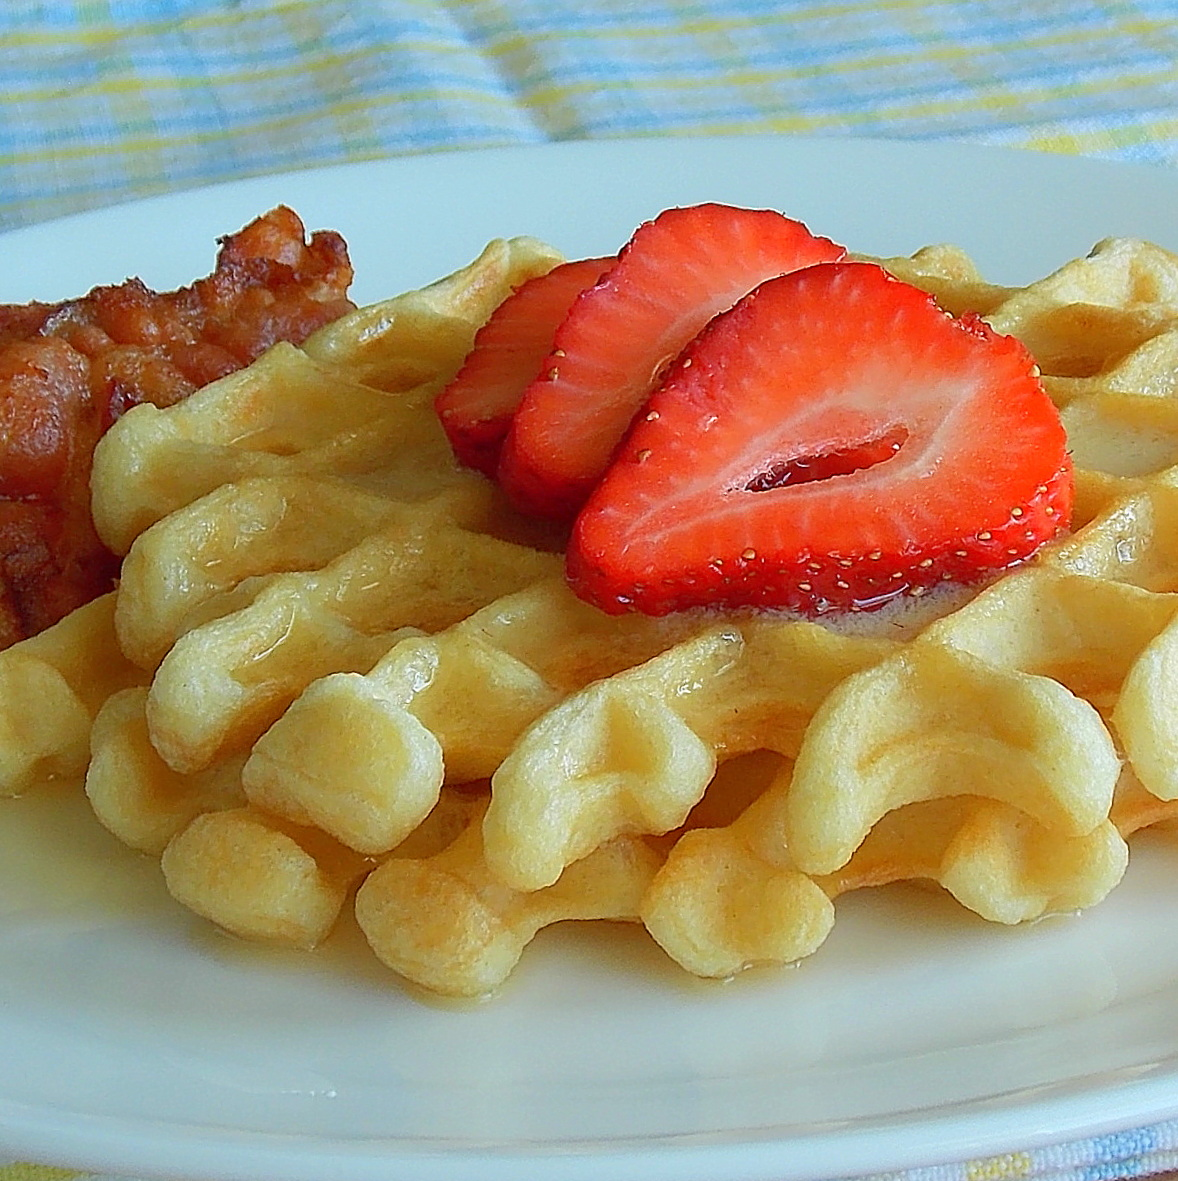 Waffles II - Grumpy's Honey Bunch